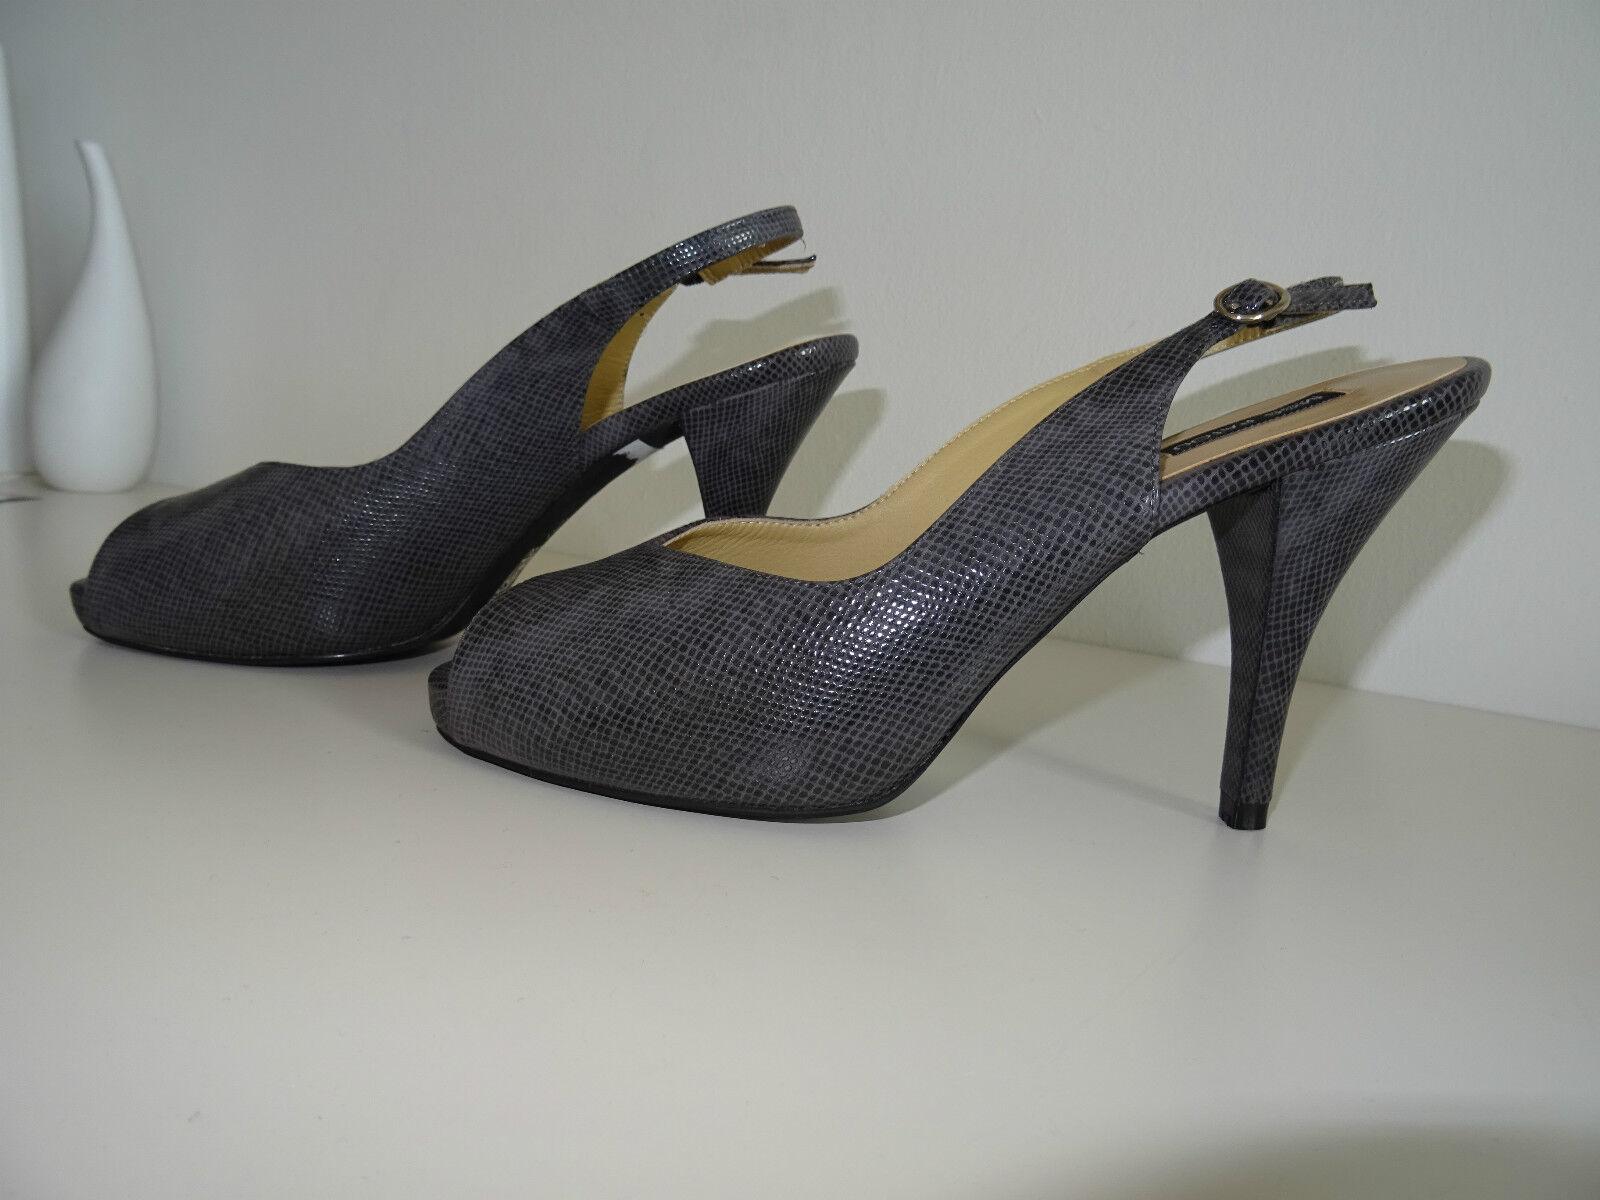 Neu Miss Patou Slingpumps Peeptoes Schuhe Gr.37 Grau Schlangenoptik